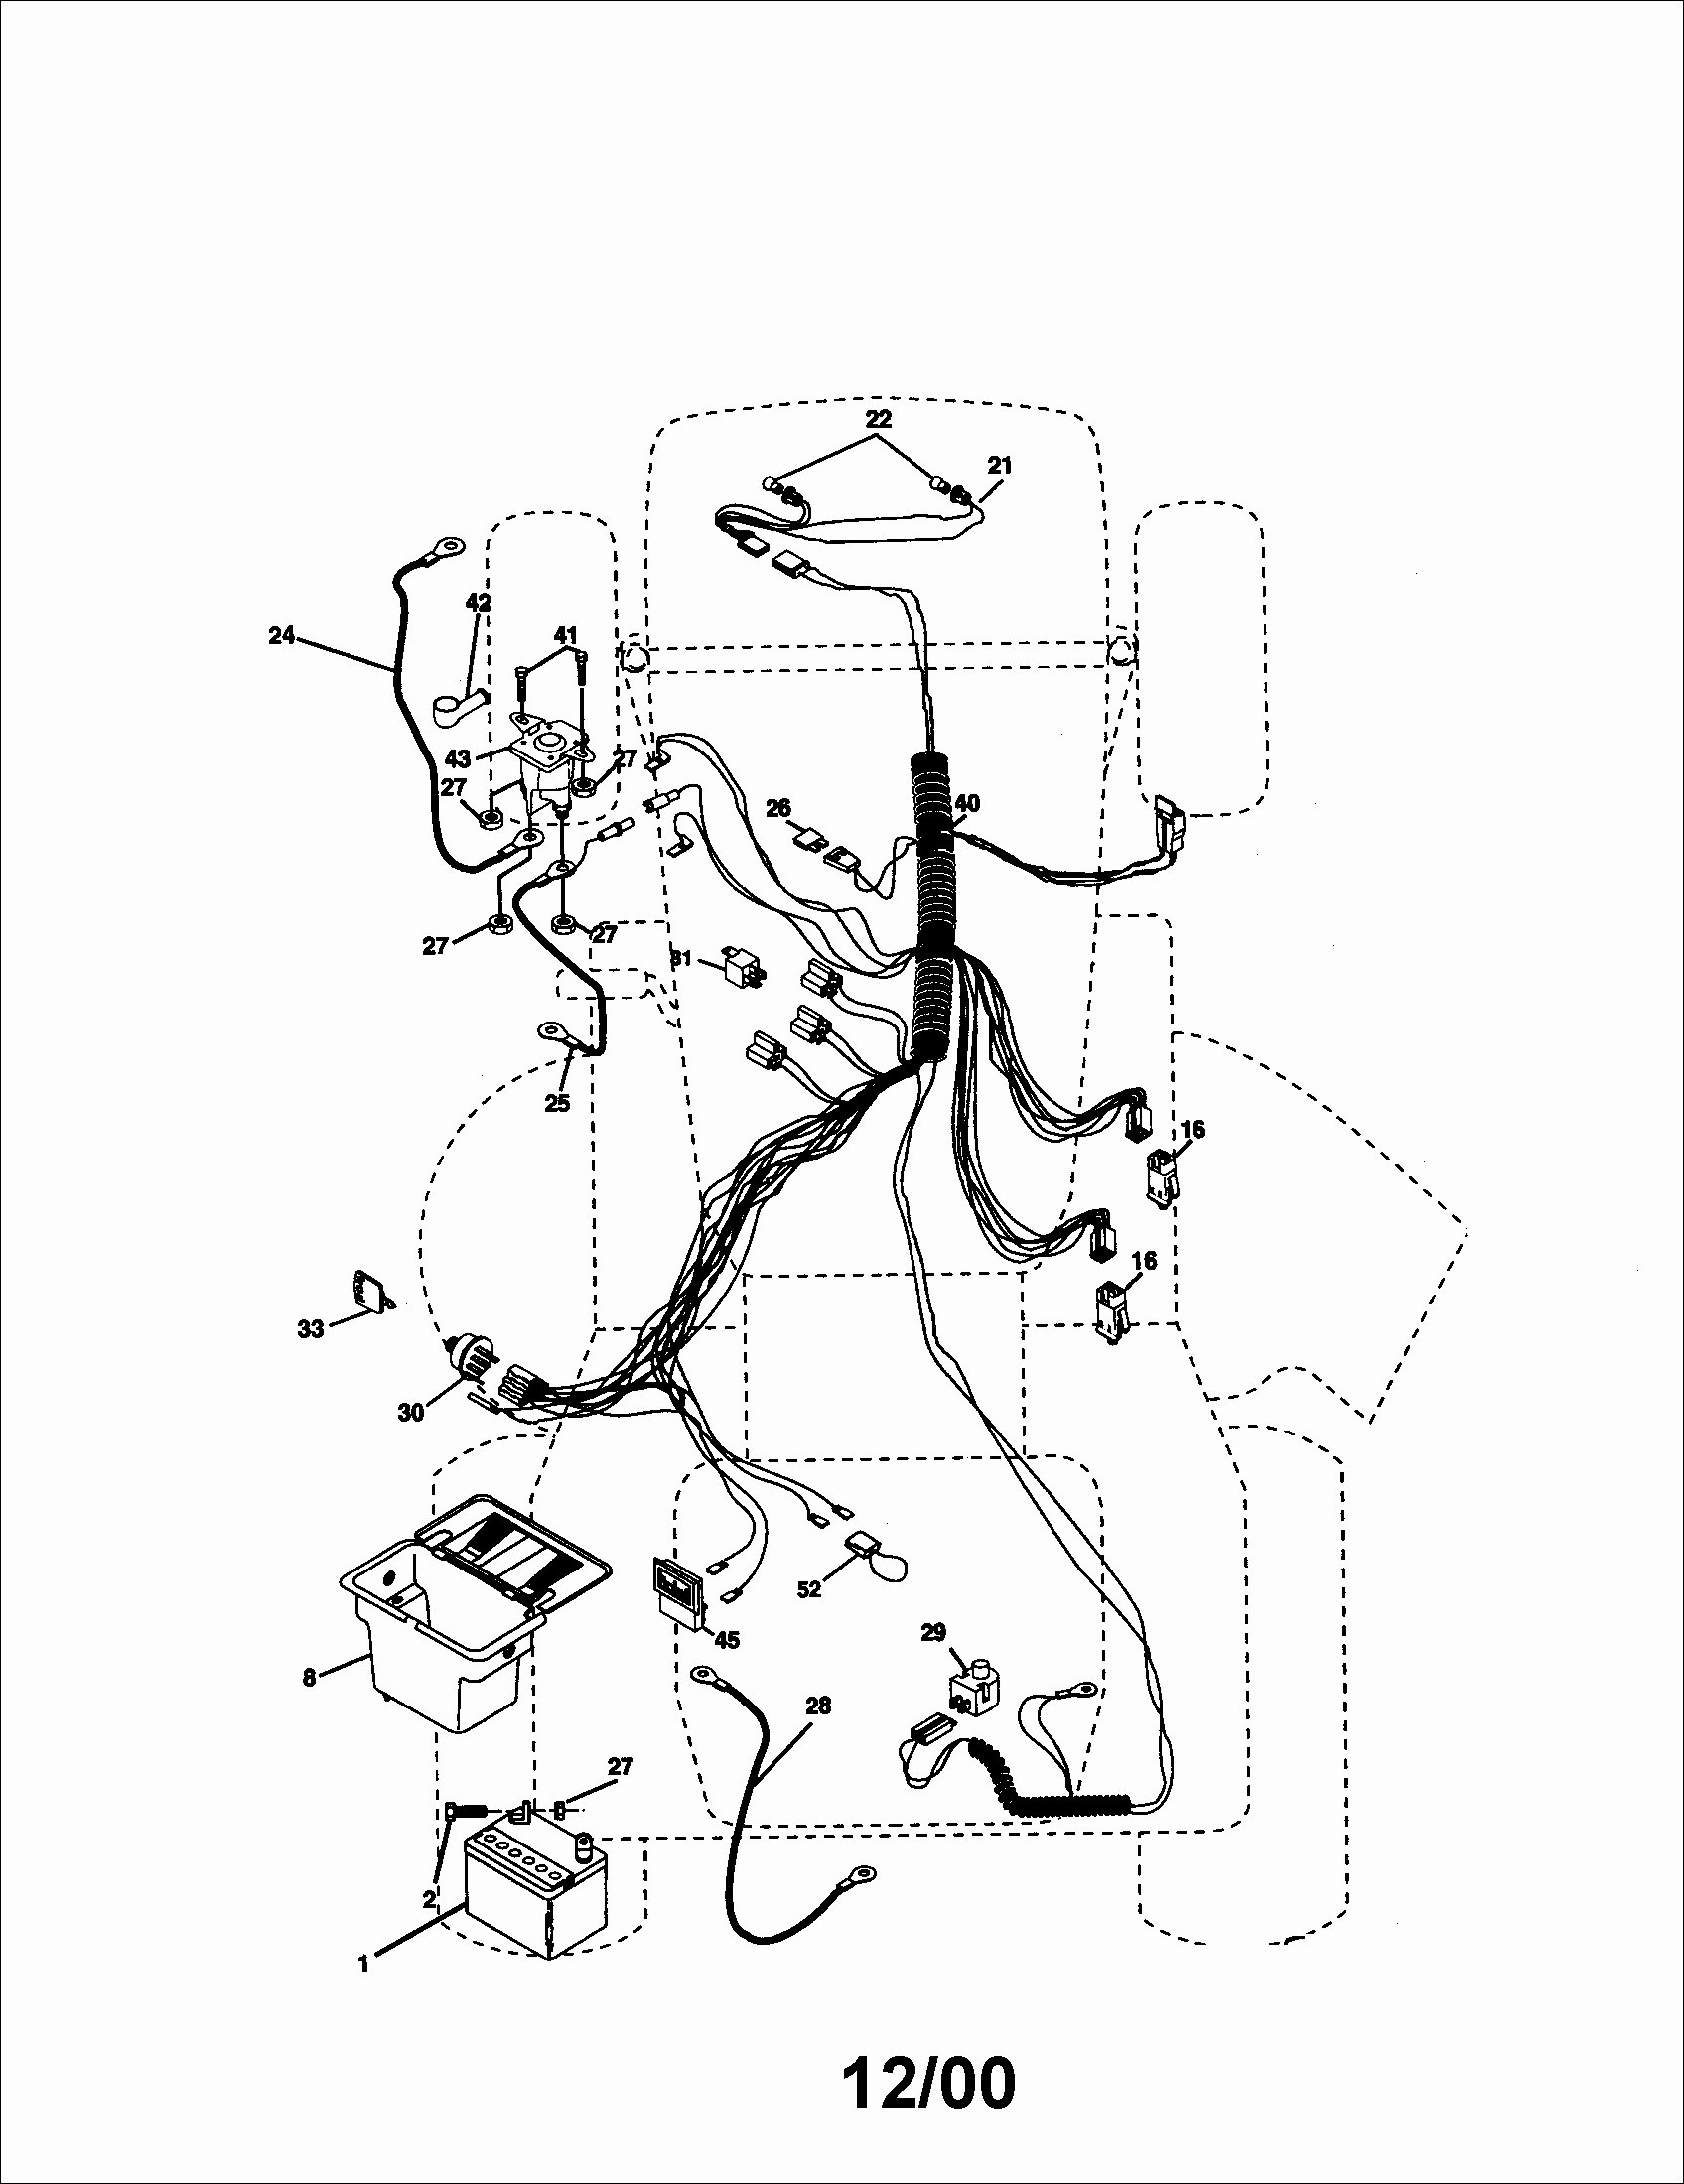 Craftsman Lt1000 Wiring Diagram | Wiring Library - Craftsman Model 917 Wiring Diagram